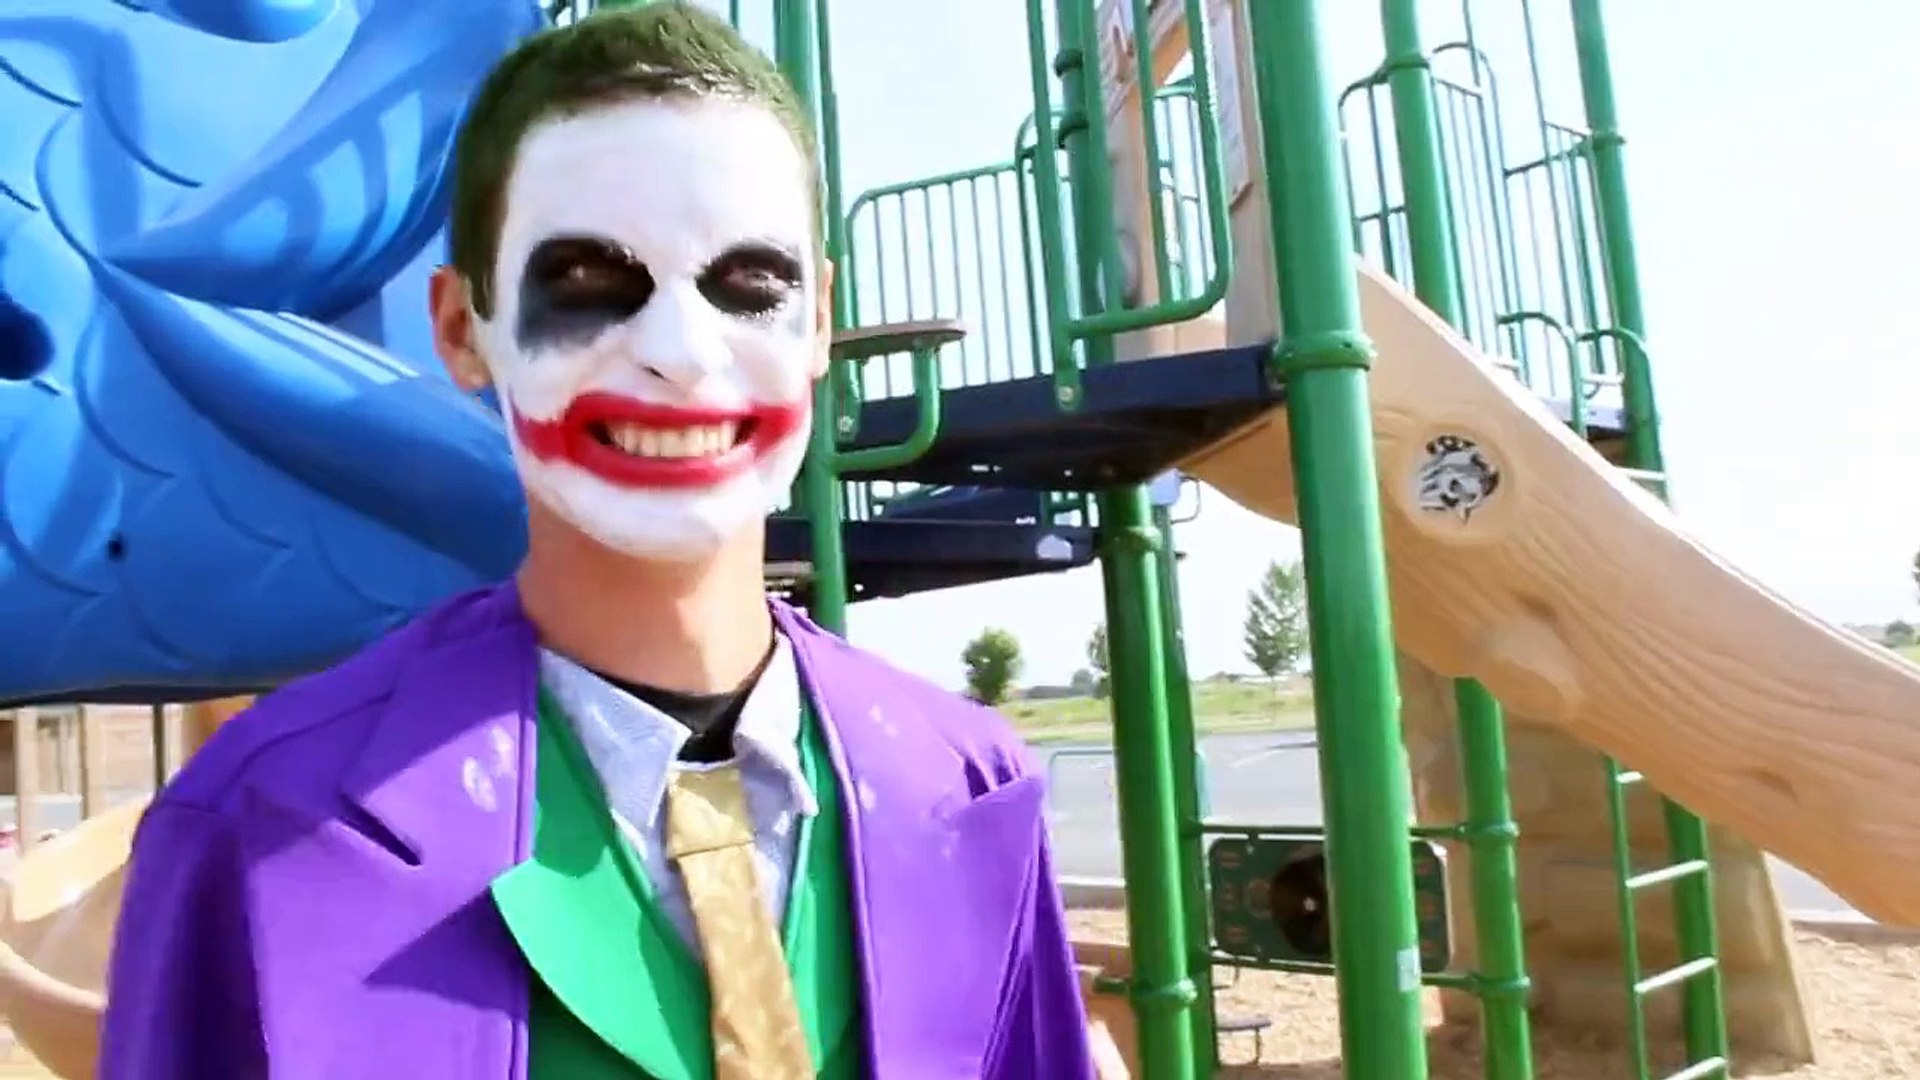 Spiderman Vs Joker Real Life Superhero Battle Death Match Video Dailymotion